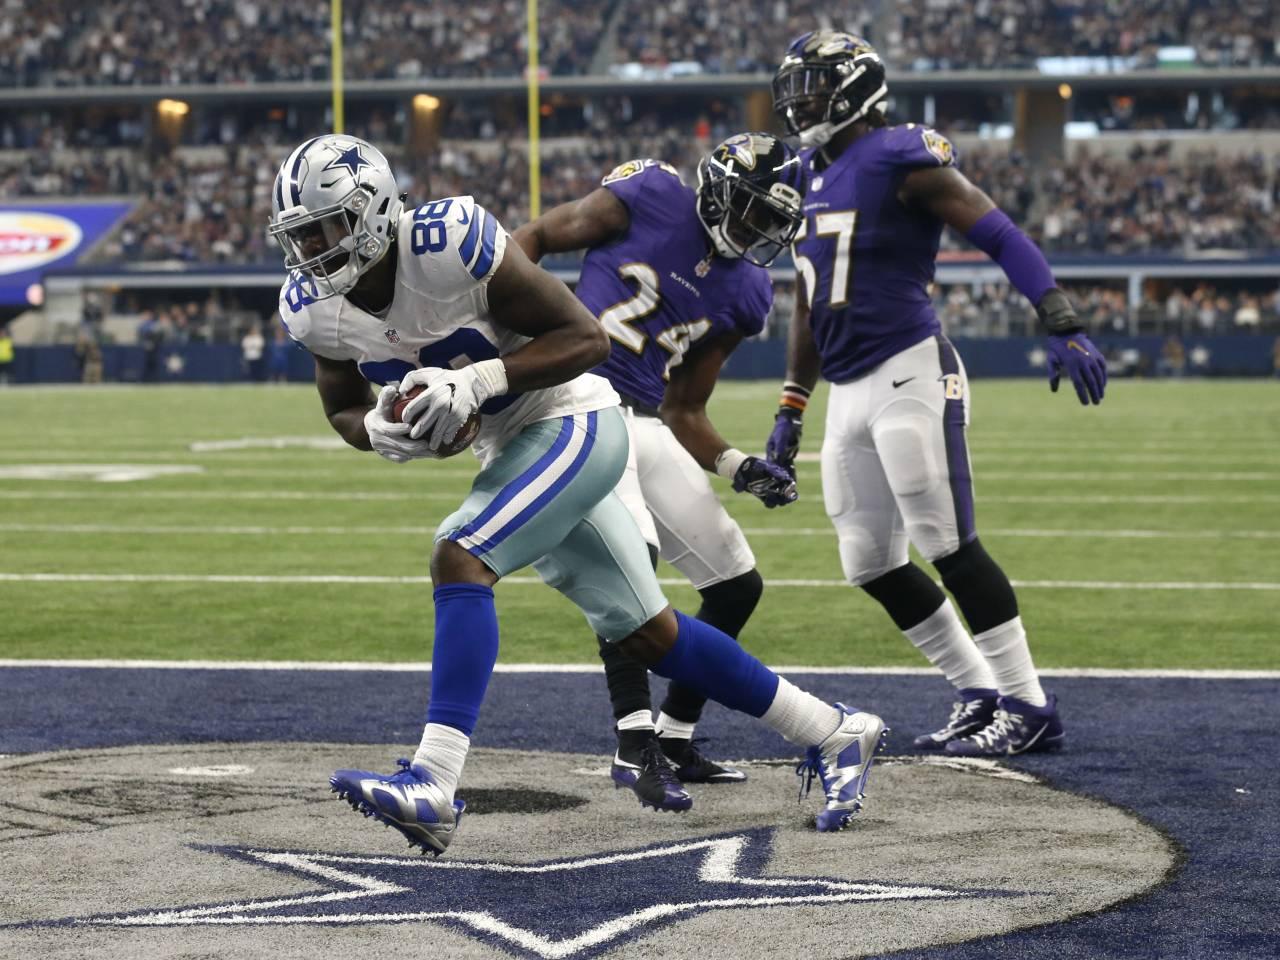 Jerry Jones: Demoted Romo still has future with Cowboys